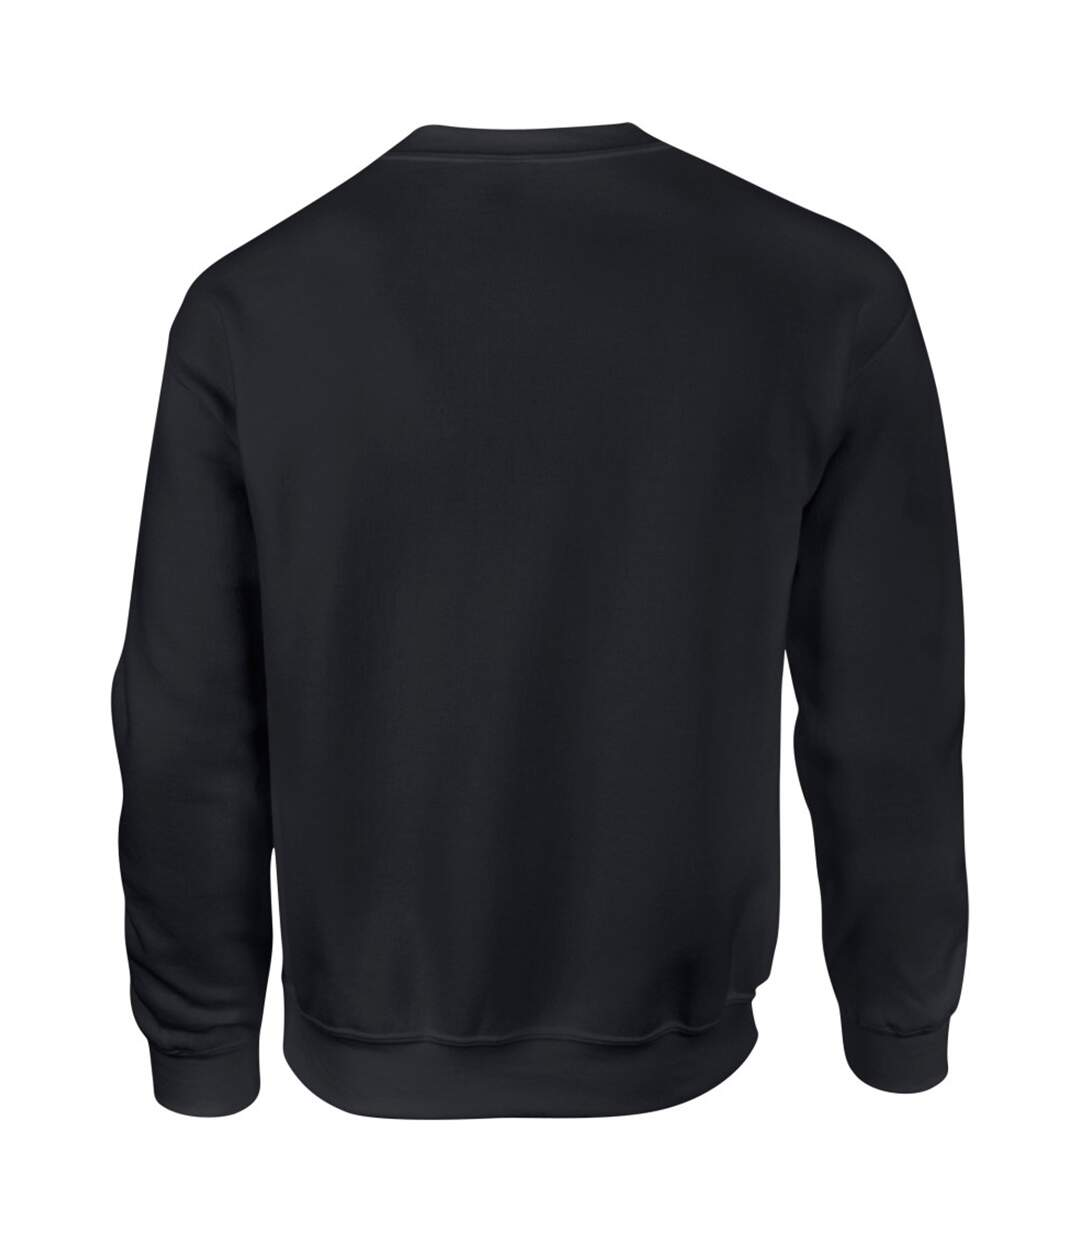 Gildan DryBlend Adult Set-In Crew Neck Sweatshirt (13 Colours) (Maroon) - UTBC459